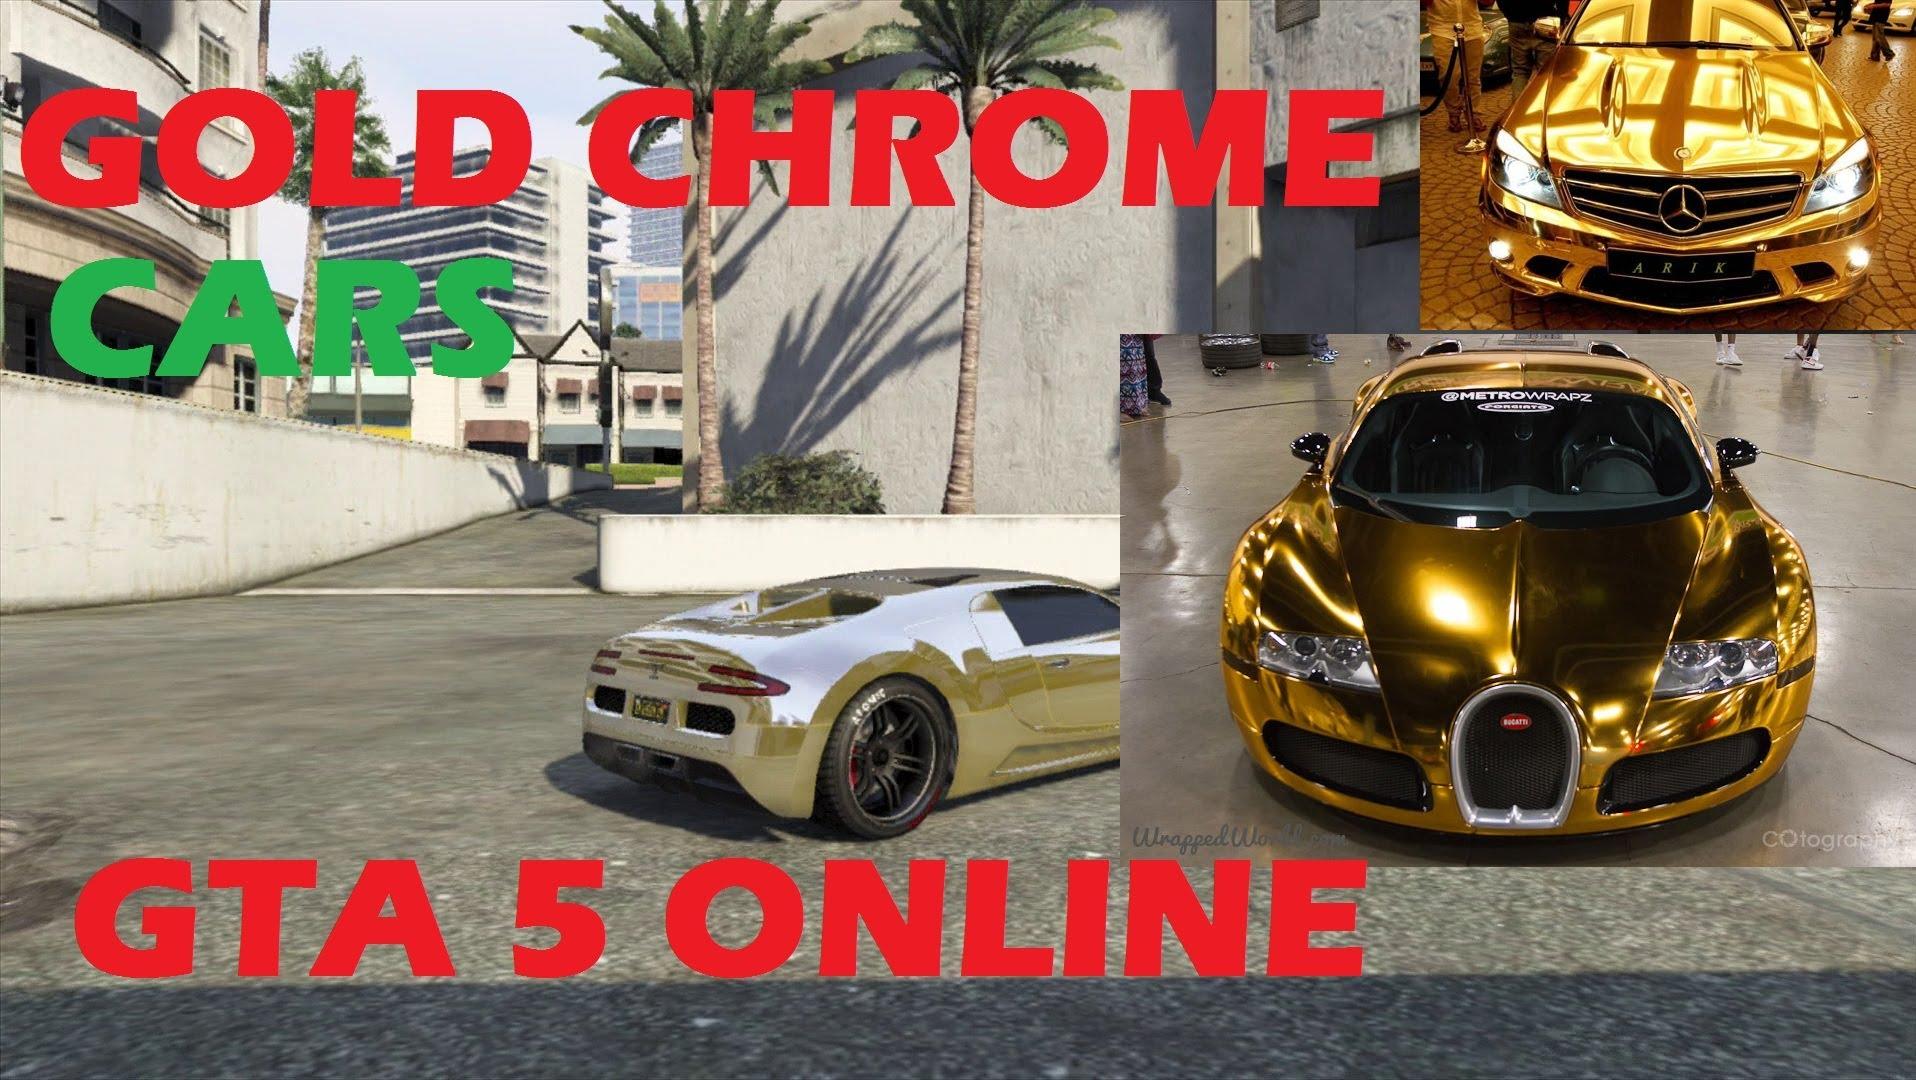 Gta 5 Online Crew Colors